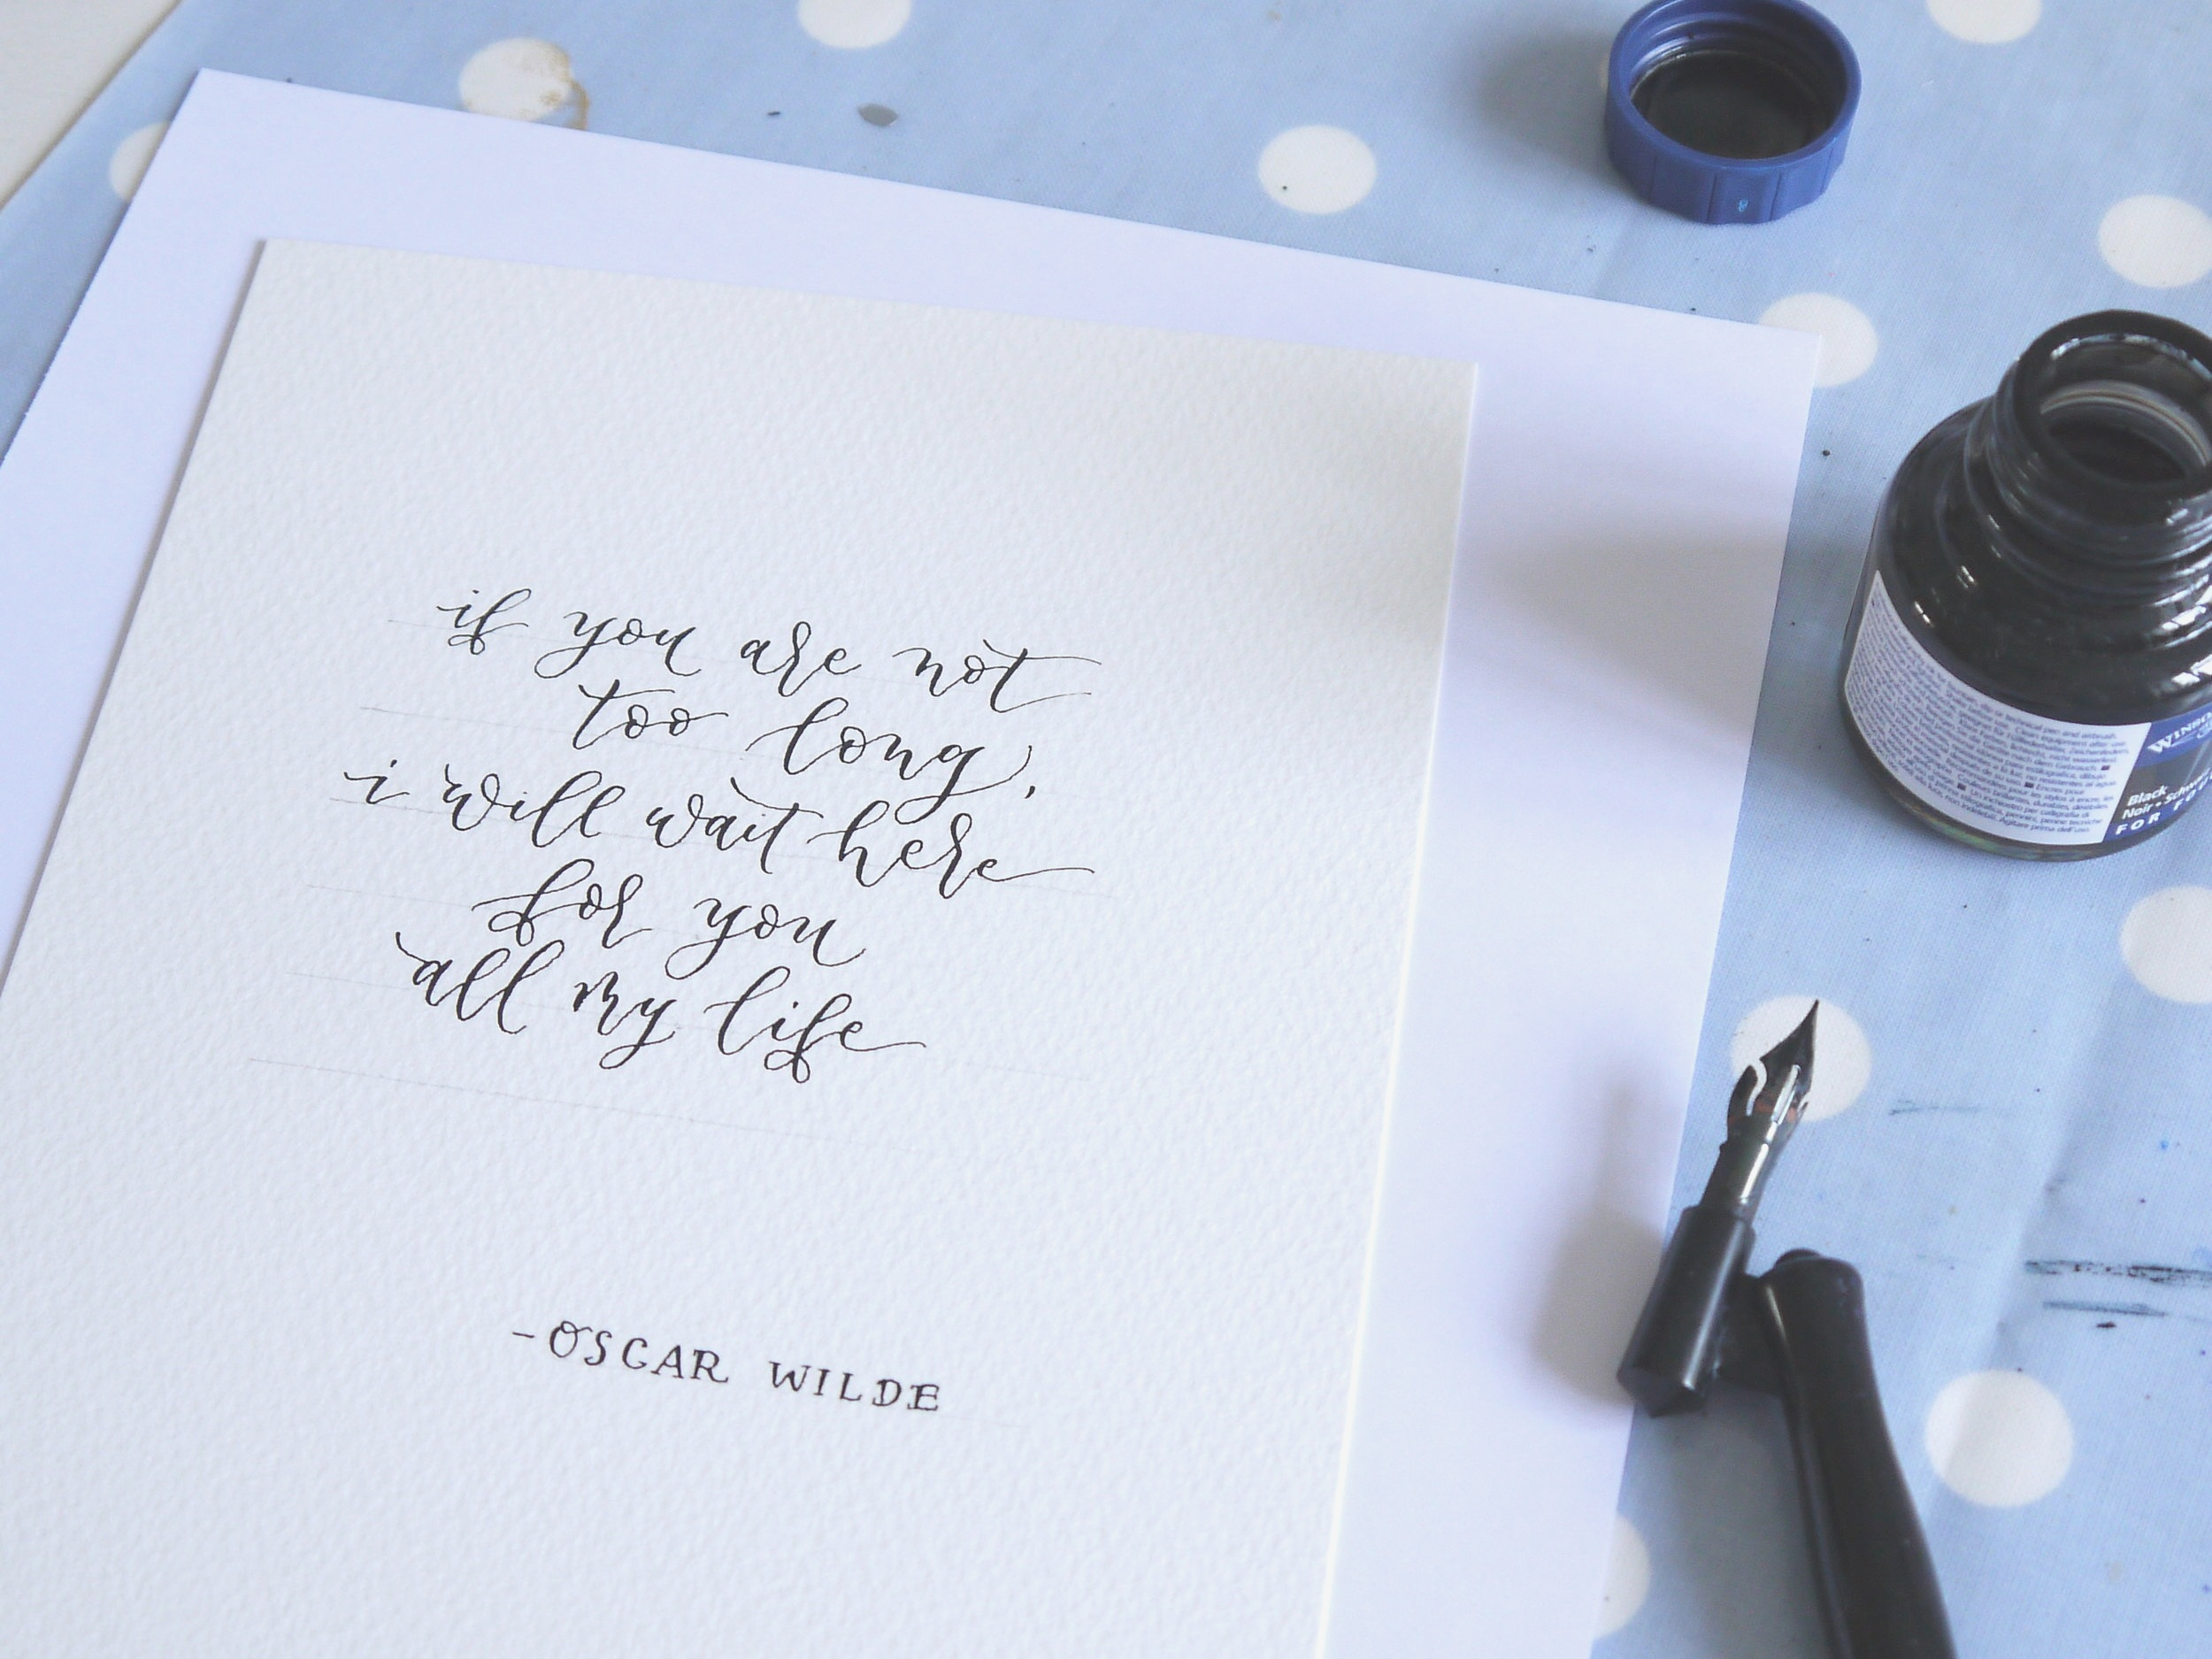 oscar wilde calligraphy quote